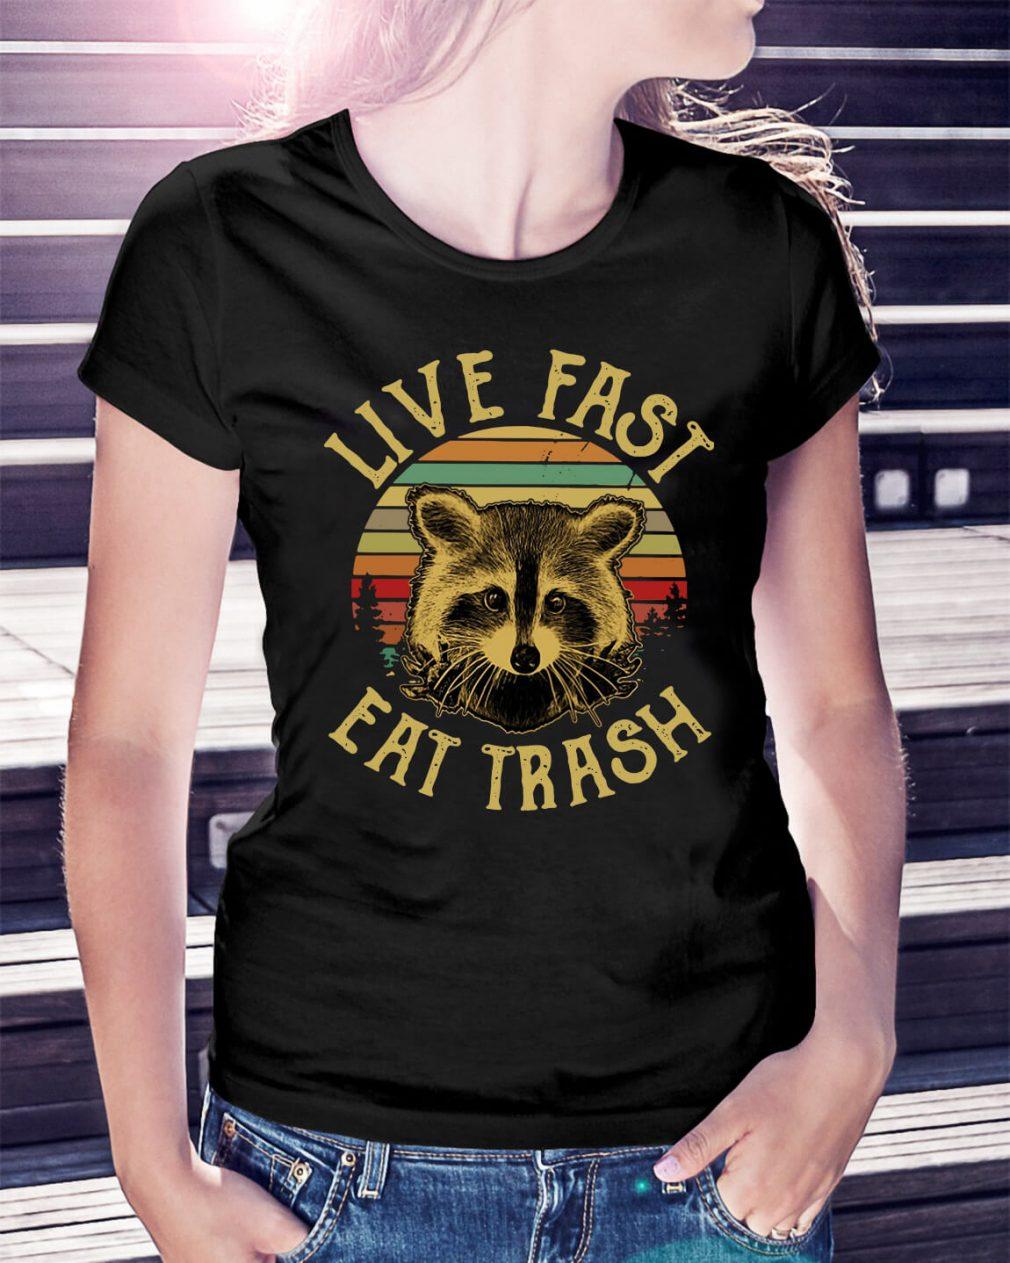 The sunset Raccoon live fast eat trash Ladies Tee